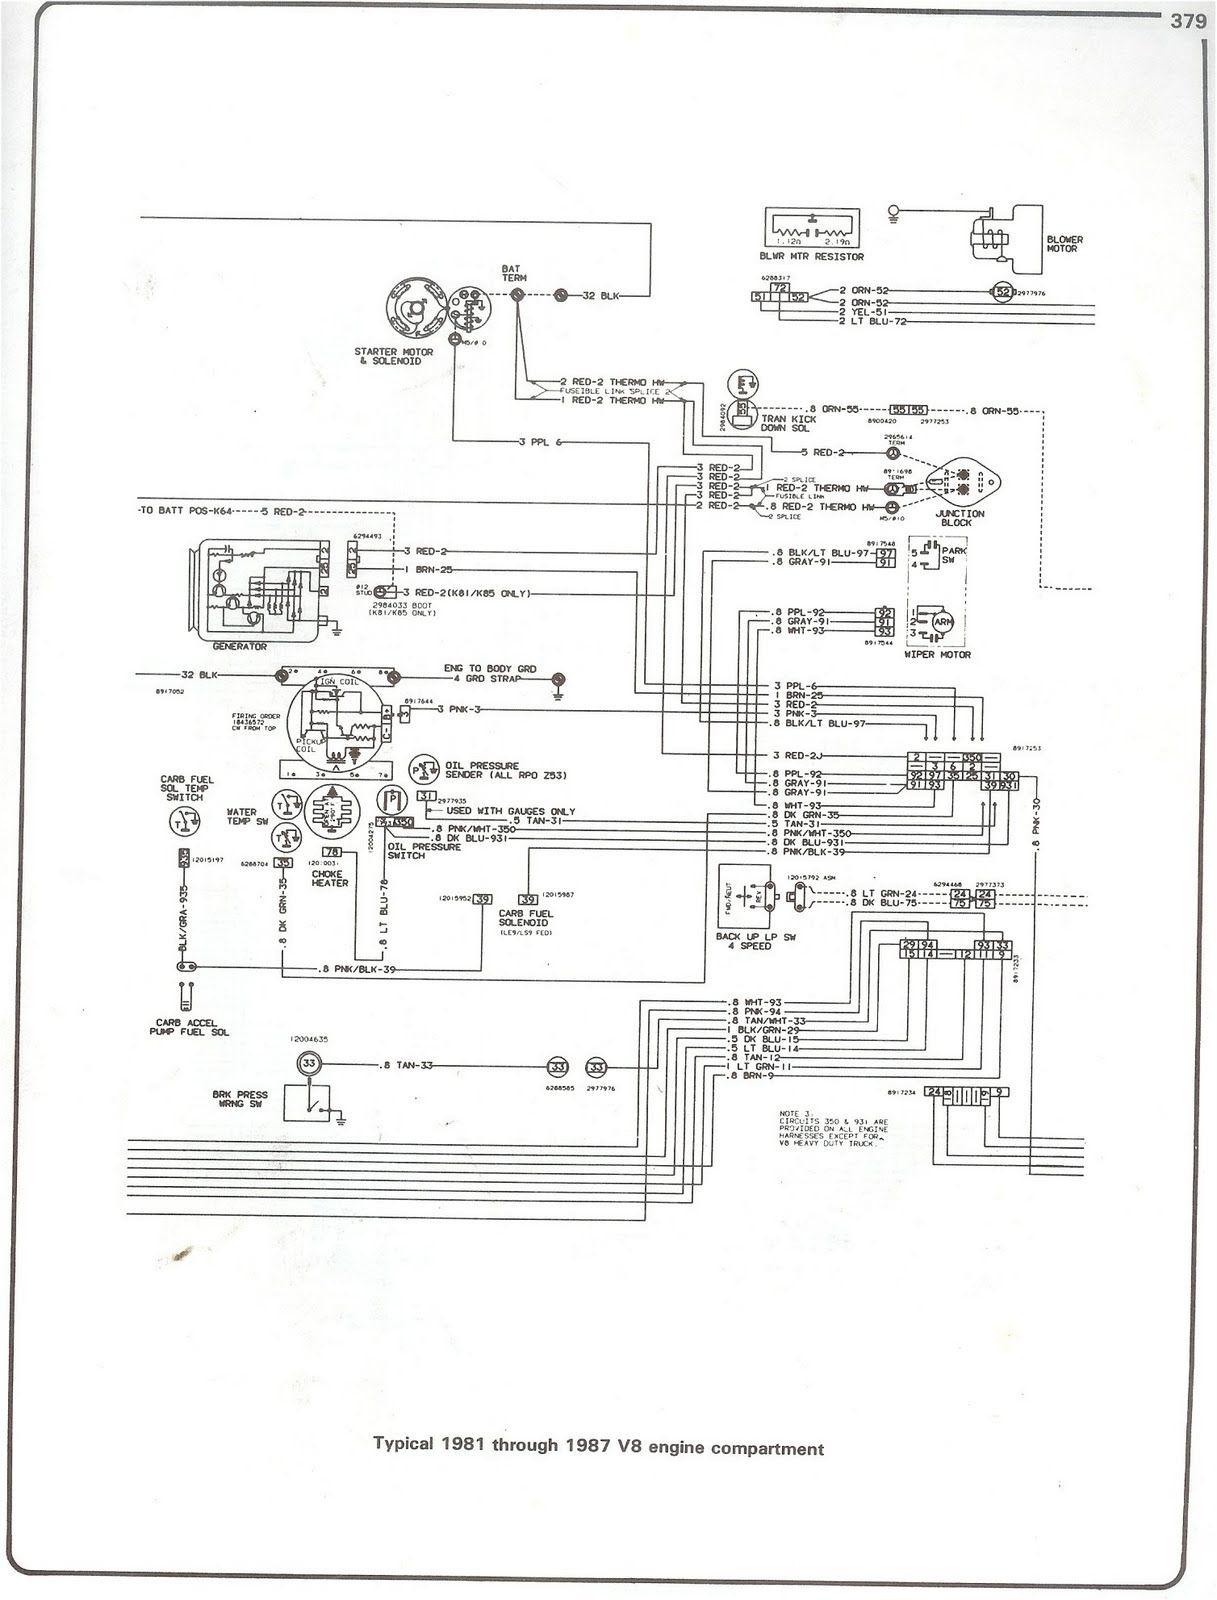 Marvelous 1987 Chevy Wiring Schematic Basic Electronics Wiring Diagram Wiring Cloud Intelaidewilluminateatxorg